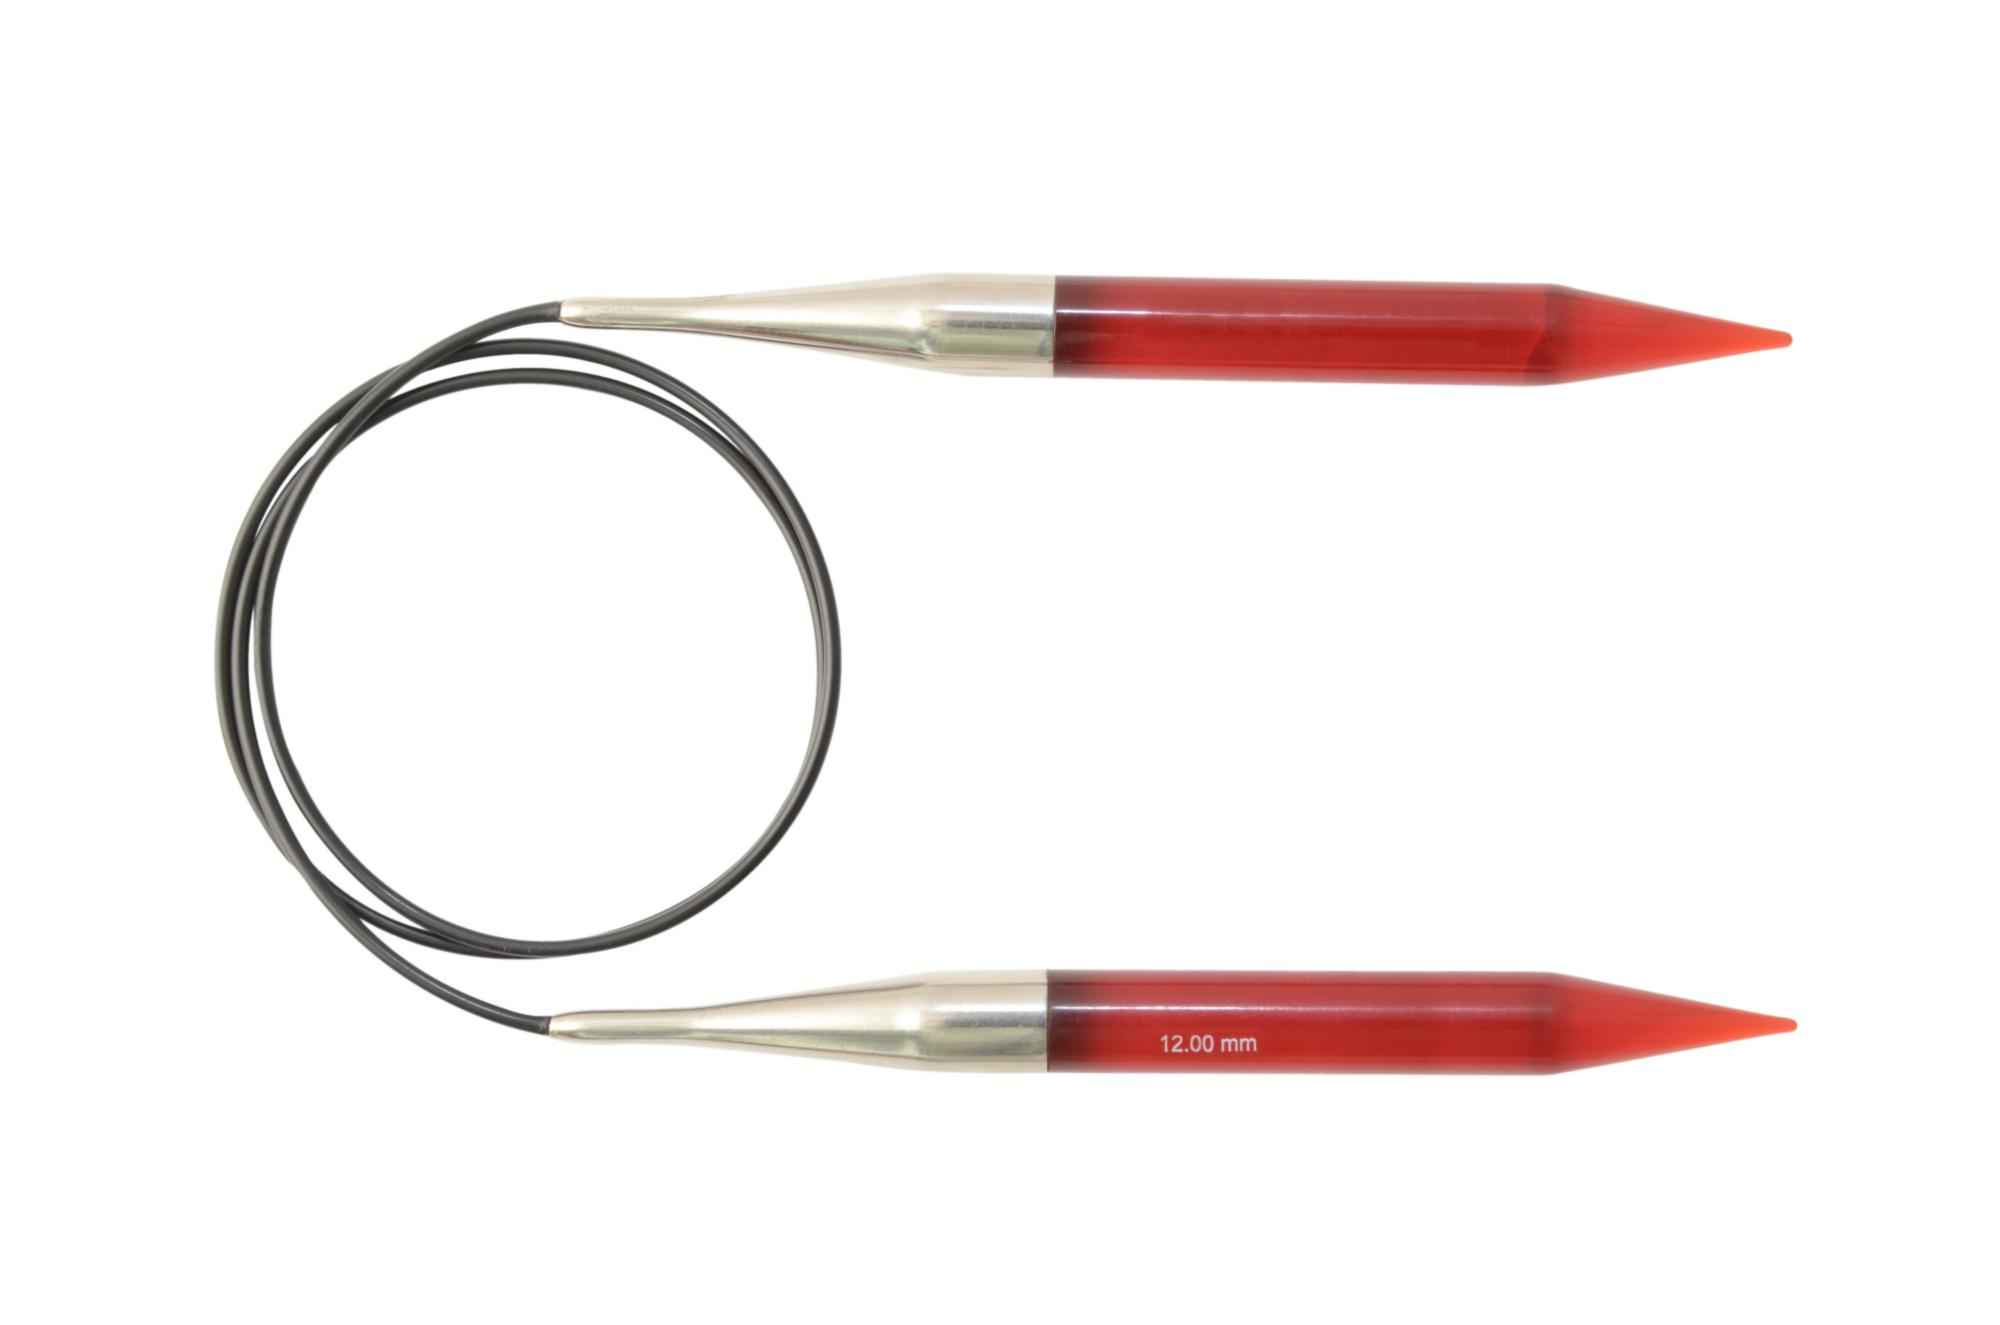 Спицы круговые 120 см Trendz KnitPro, 51153, 12.00 мм